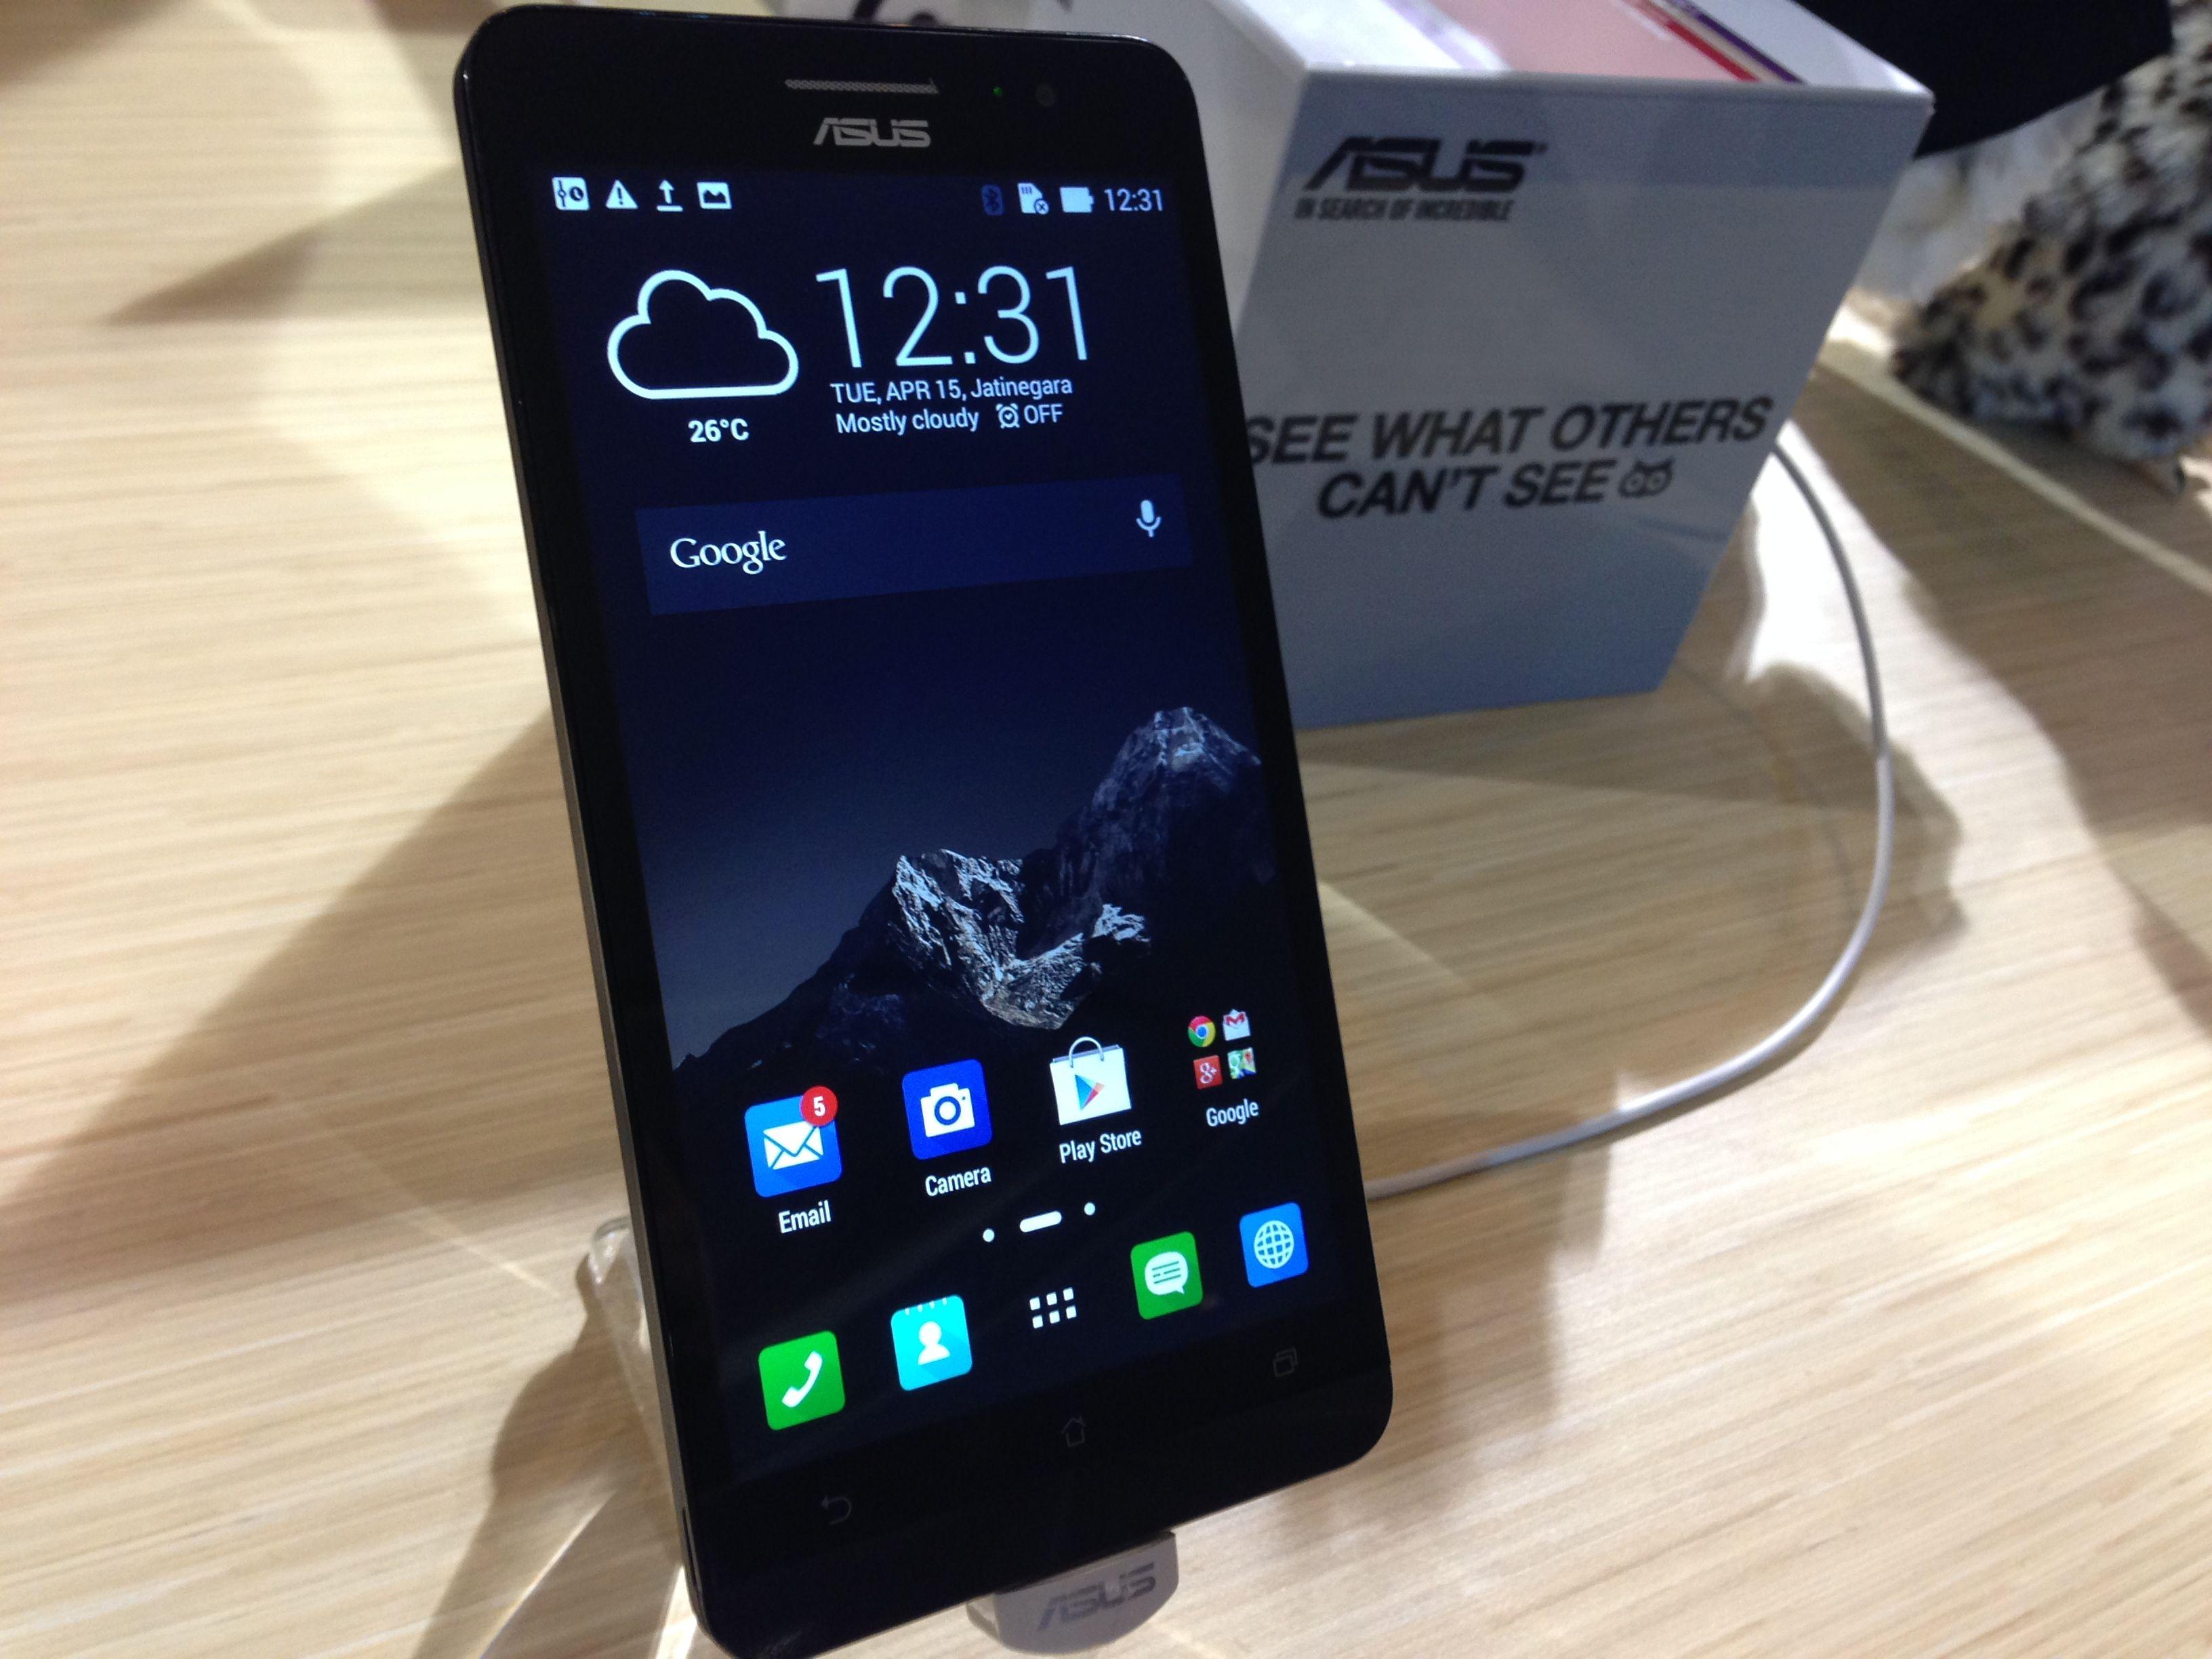 ASUS Zenfone 5 Mobile Gadgets Online Security Asus Software Development Search